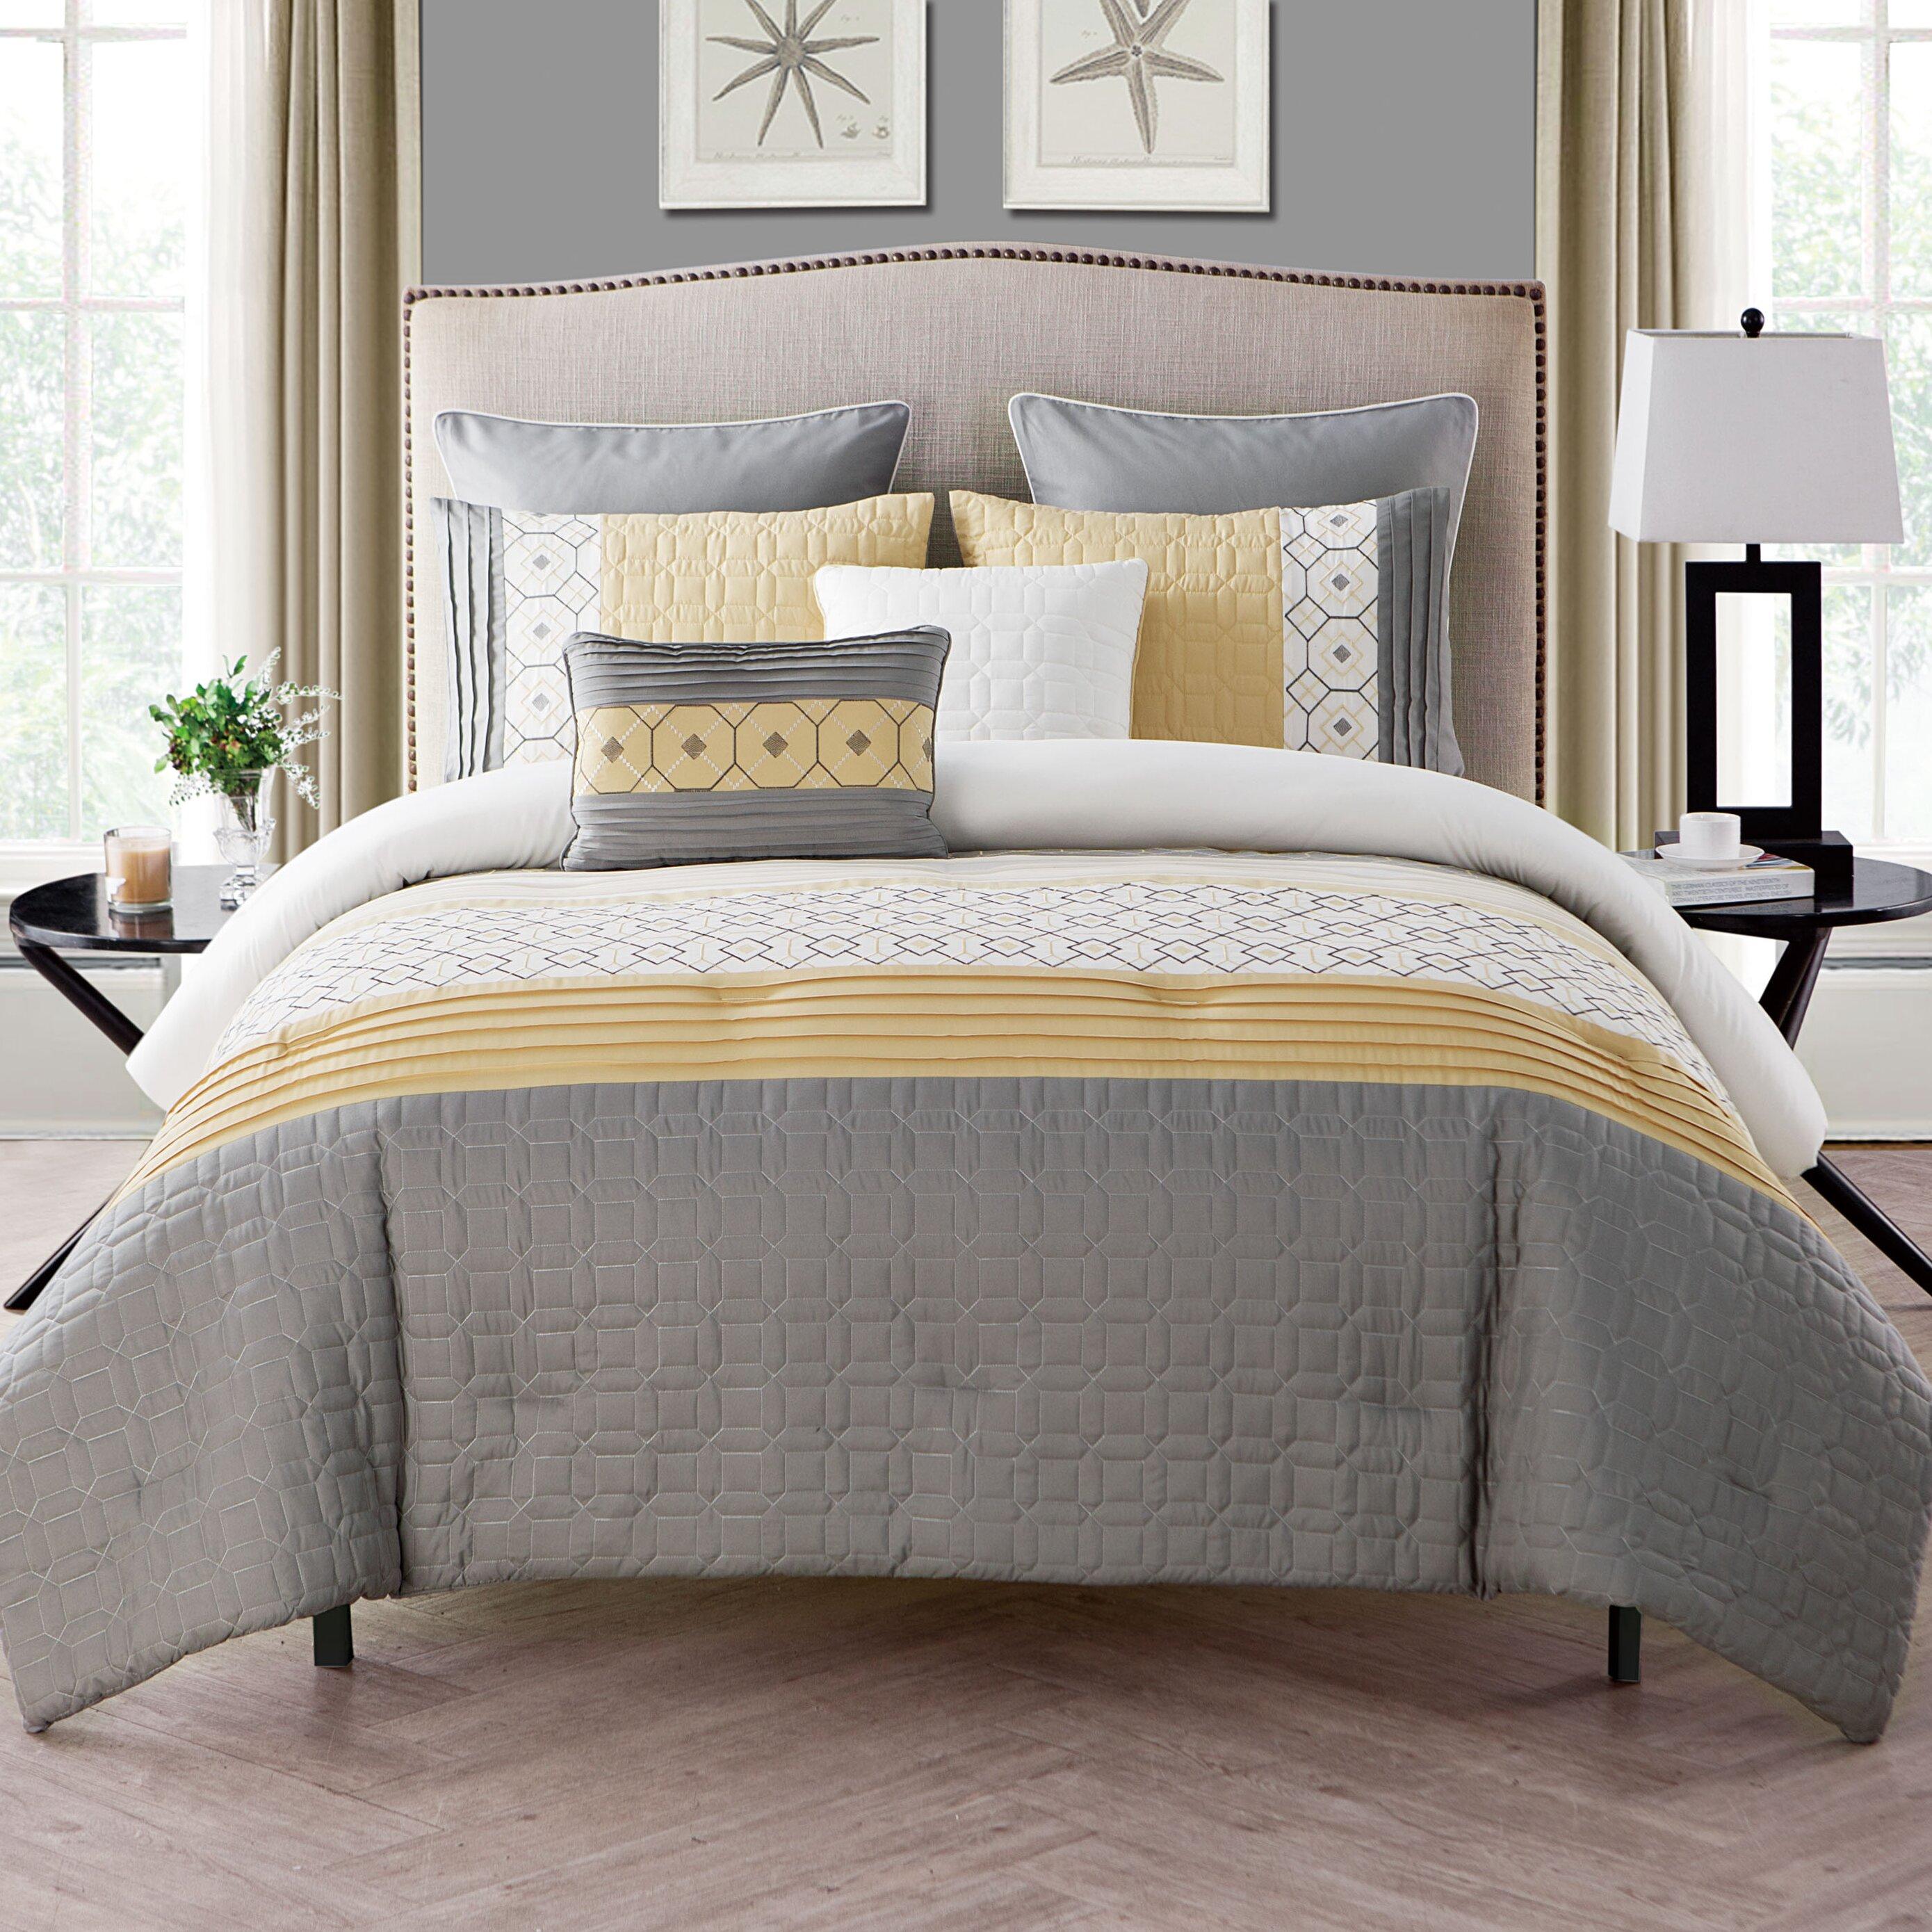 vcny winston 7 piece comforter set reviews wayfair. Black Bedroom Furniture Sets. Home Design Ideas